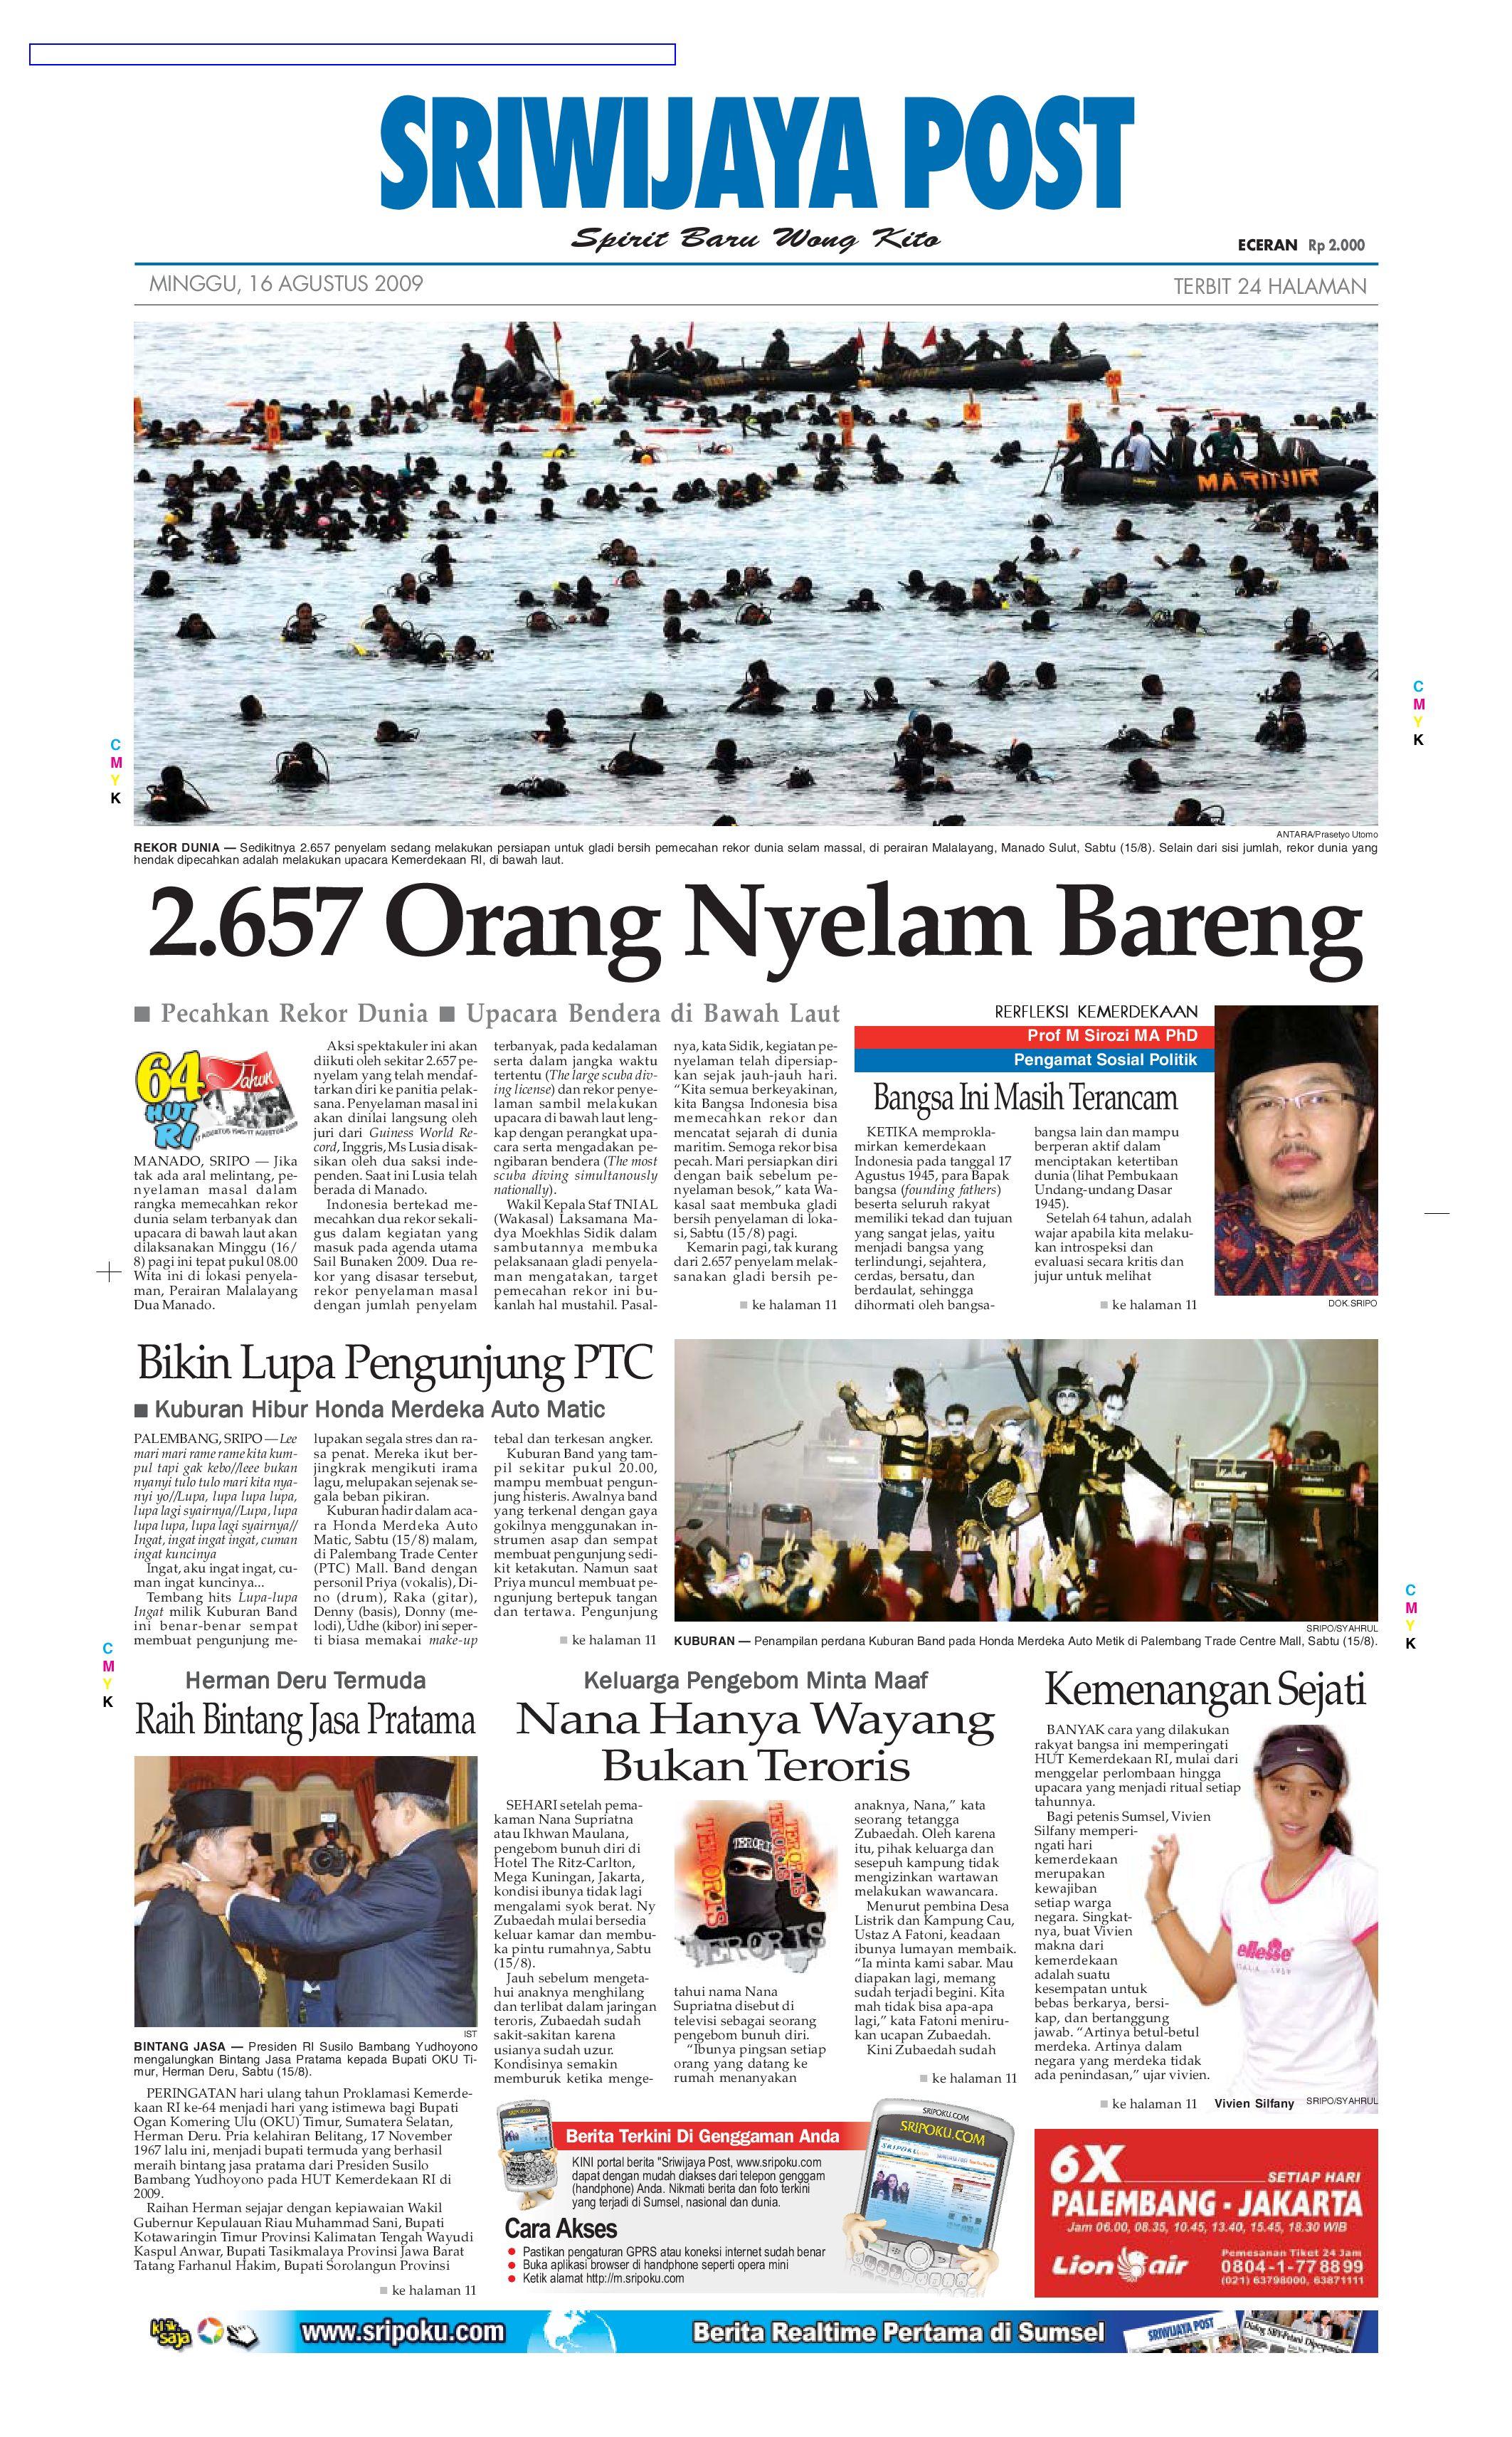 Sriwijaya Post Edisi Minggu 16 Agustus 2009 By Yulius Saputra Issuu Rejeki Anak Soleh 3 Voucher Carrefour Rp 200000